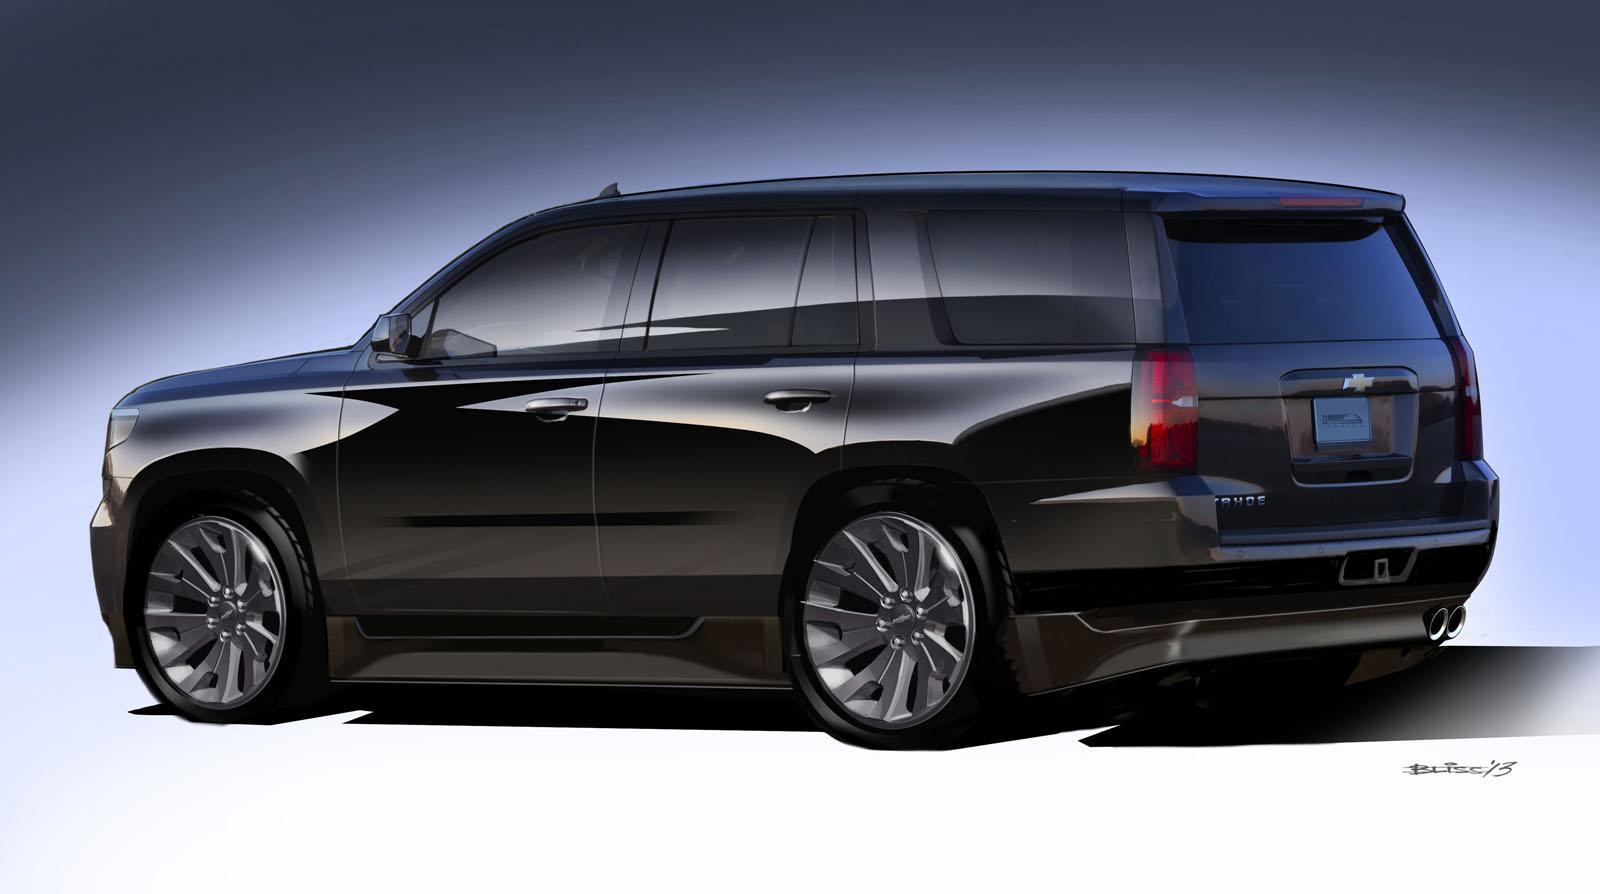 2014 Chevy Tahoe >> Chevrolet Unveils Tahoe, Suburban SEMA Concepts - autoevolution